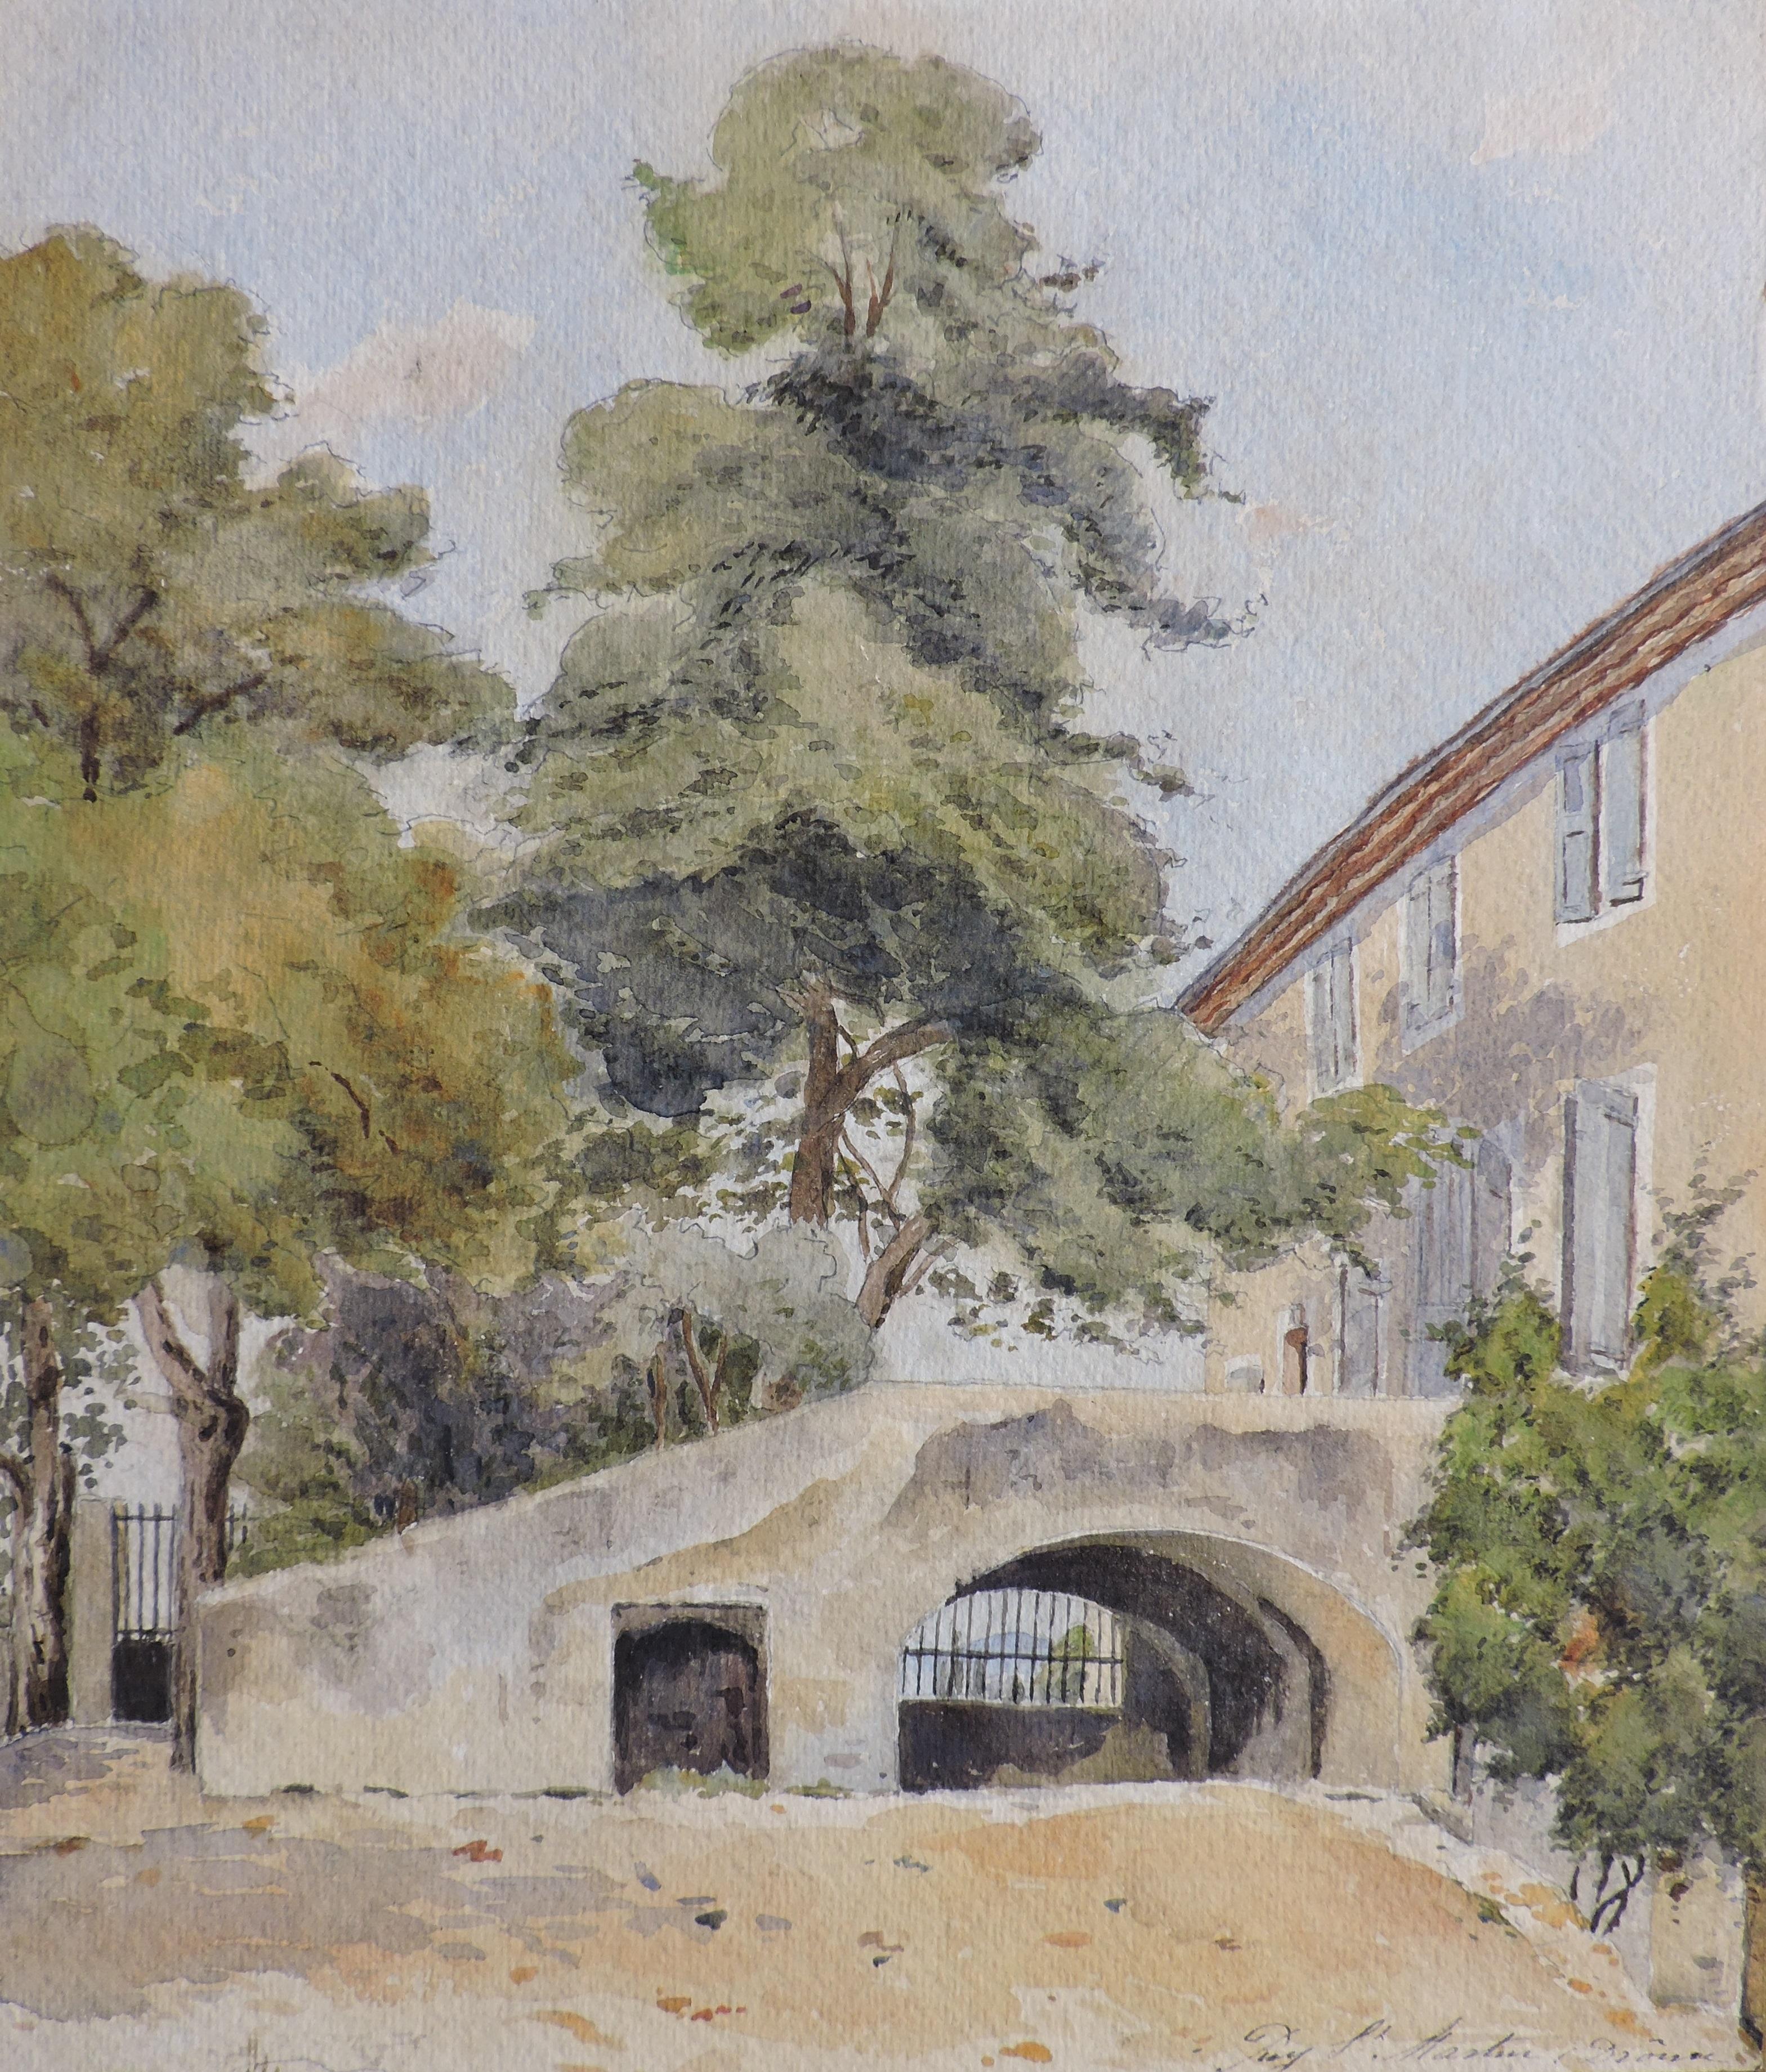 Puy-Saint-Martin – Paul-Emile Lecomte